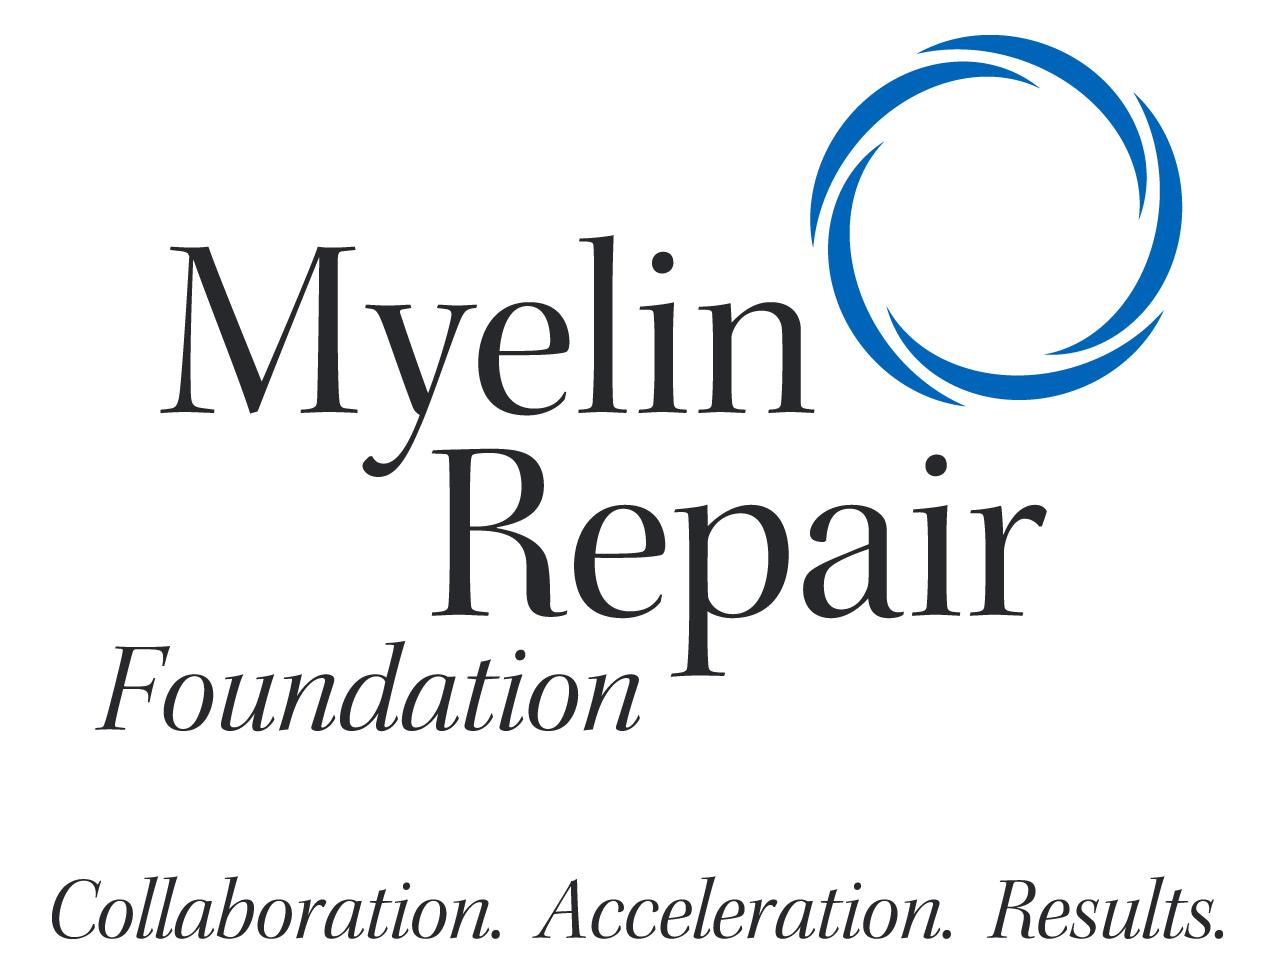 myelin-repair-foundation